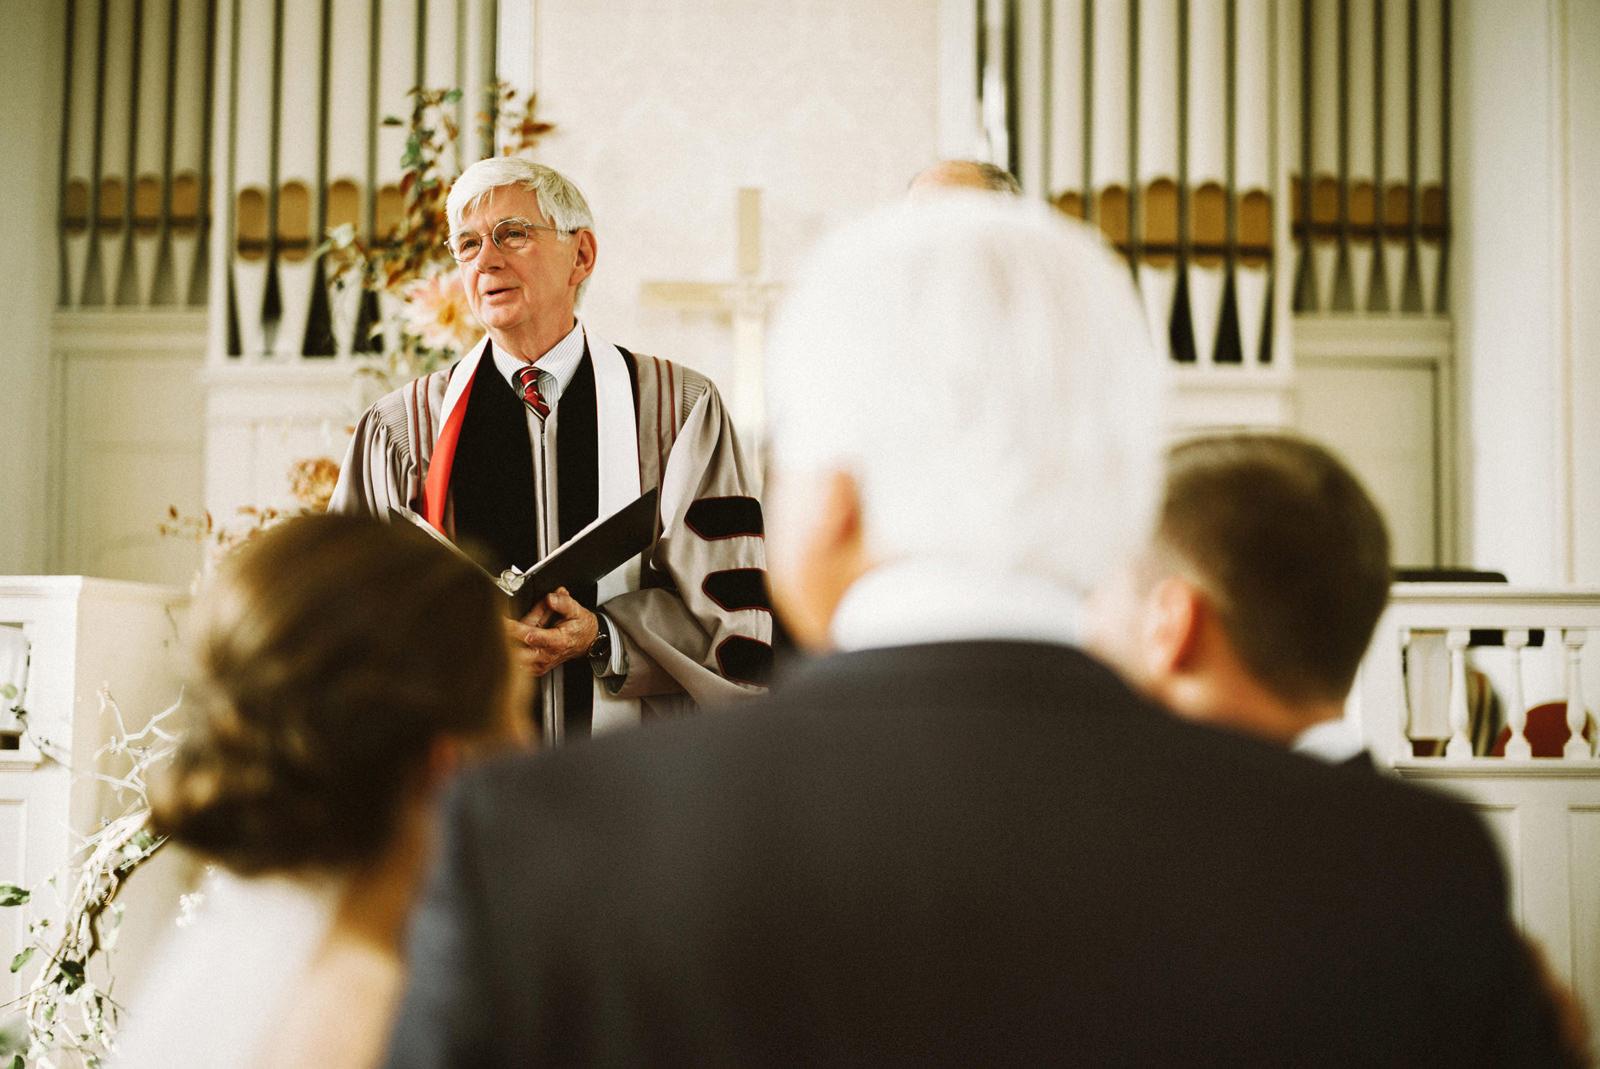 bridgeport-wedding-056 BRIDGEPORT, CONNECTICUT BACKYARD WEDDING